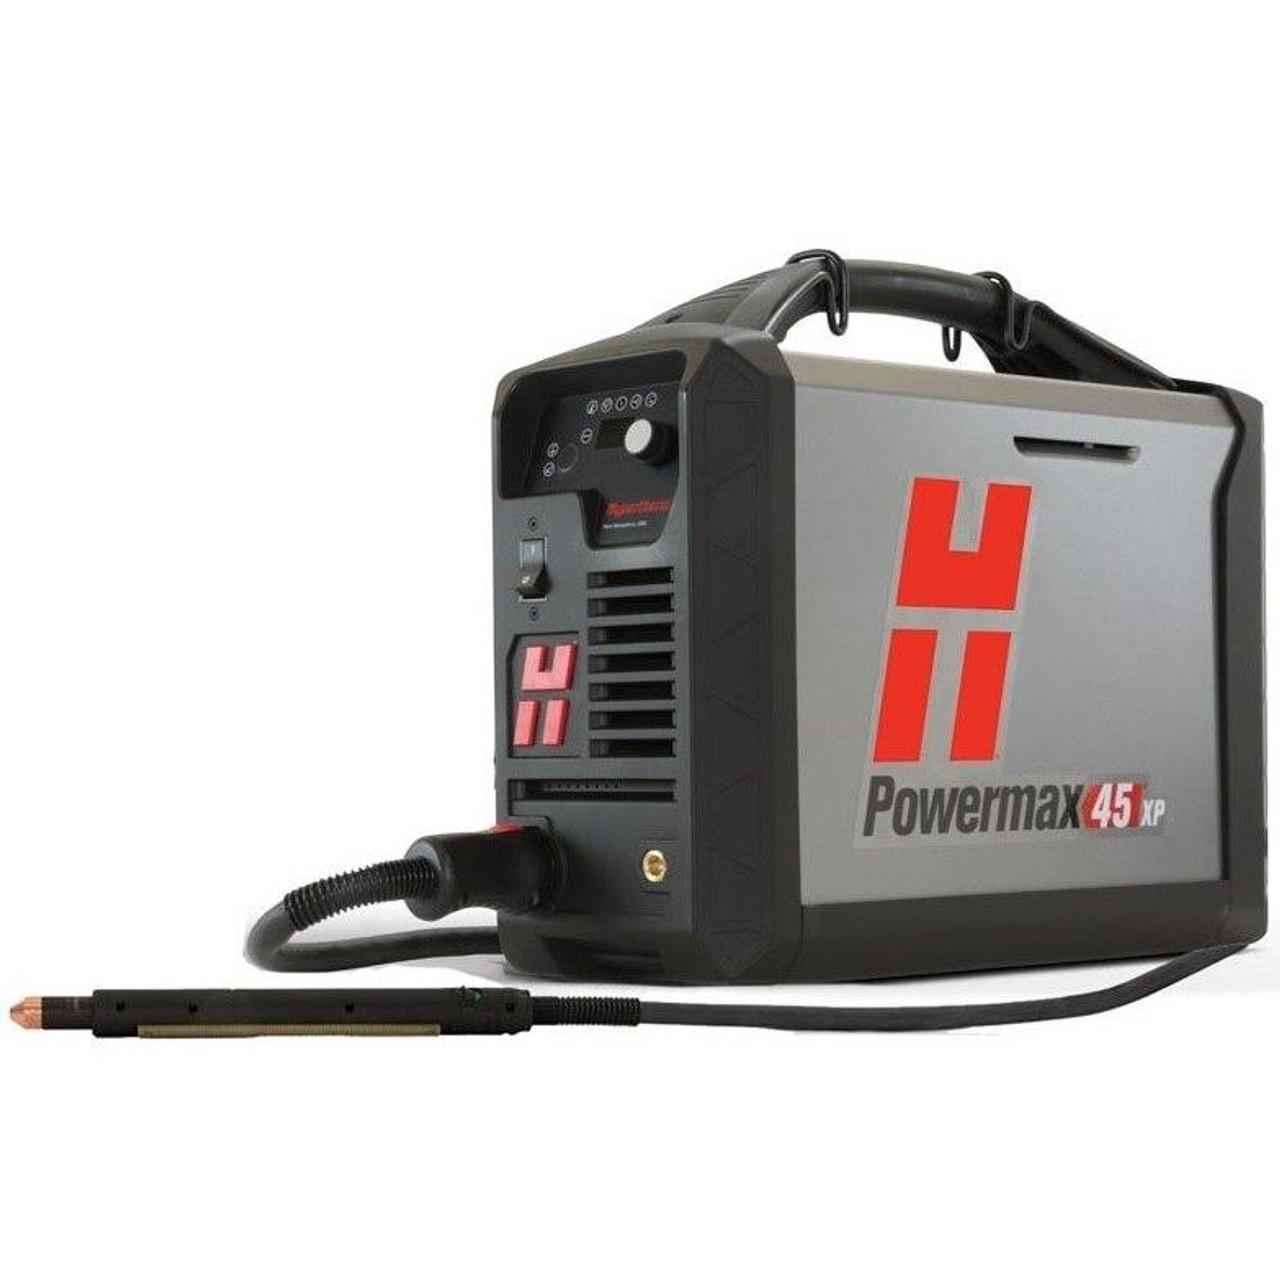 Hypertherm Powermax 45 XP Plasma Cutter 50 Machine System 088122